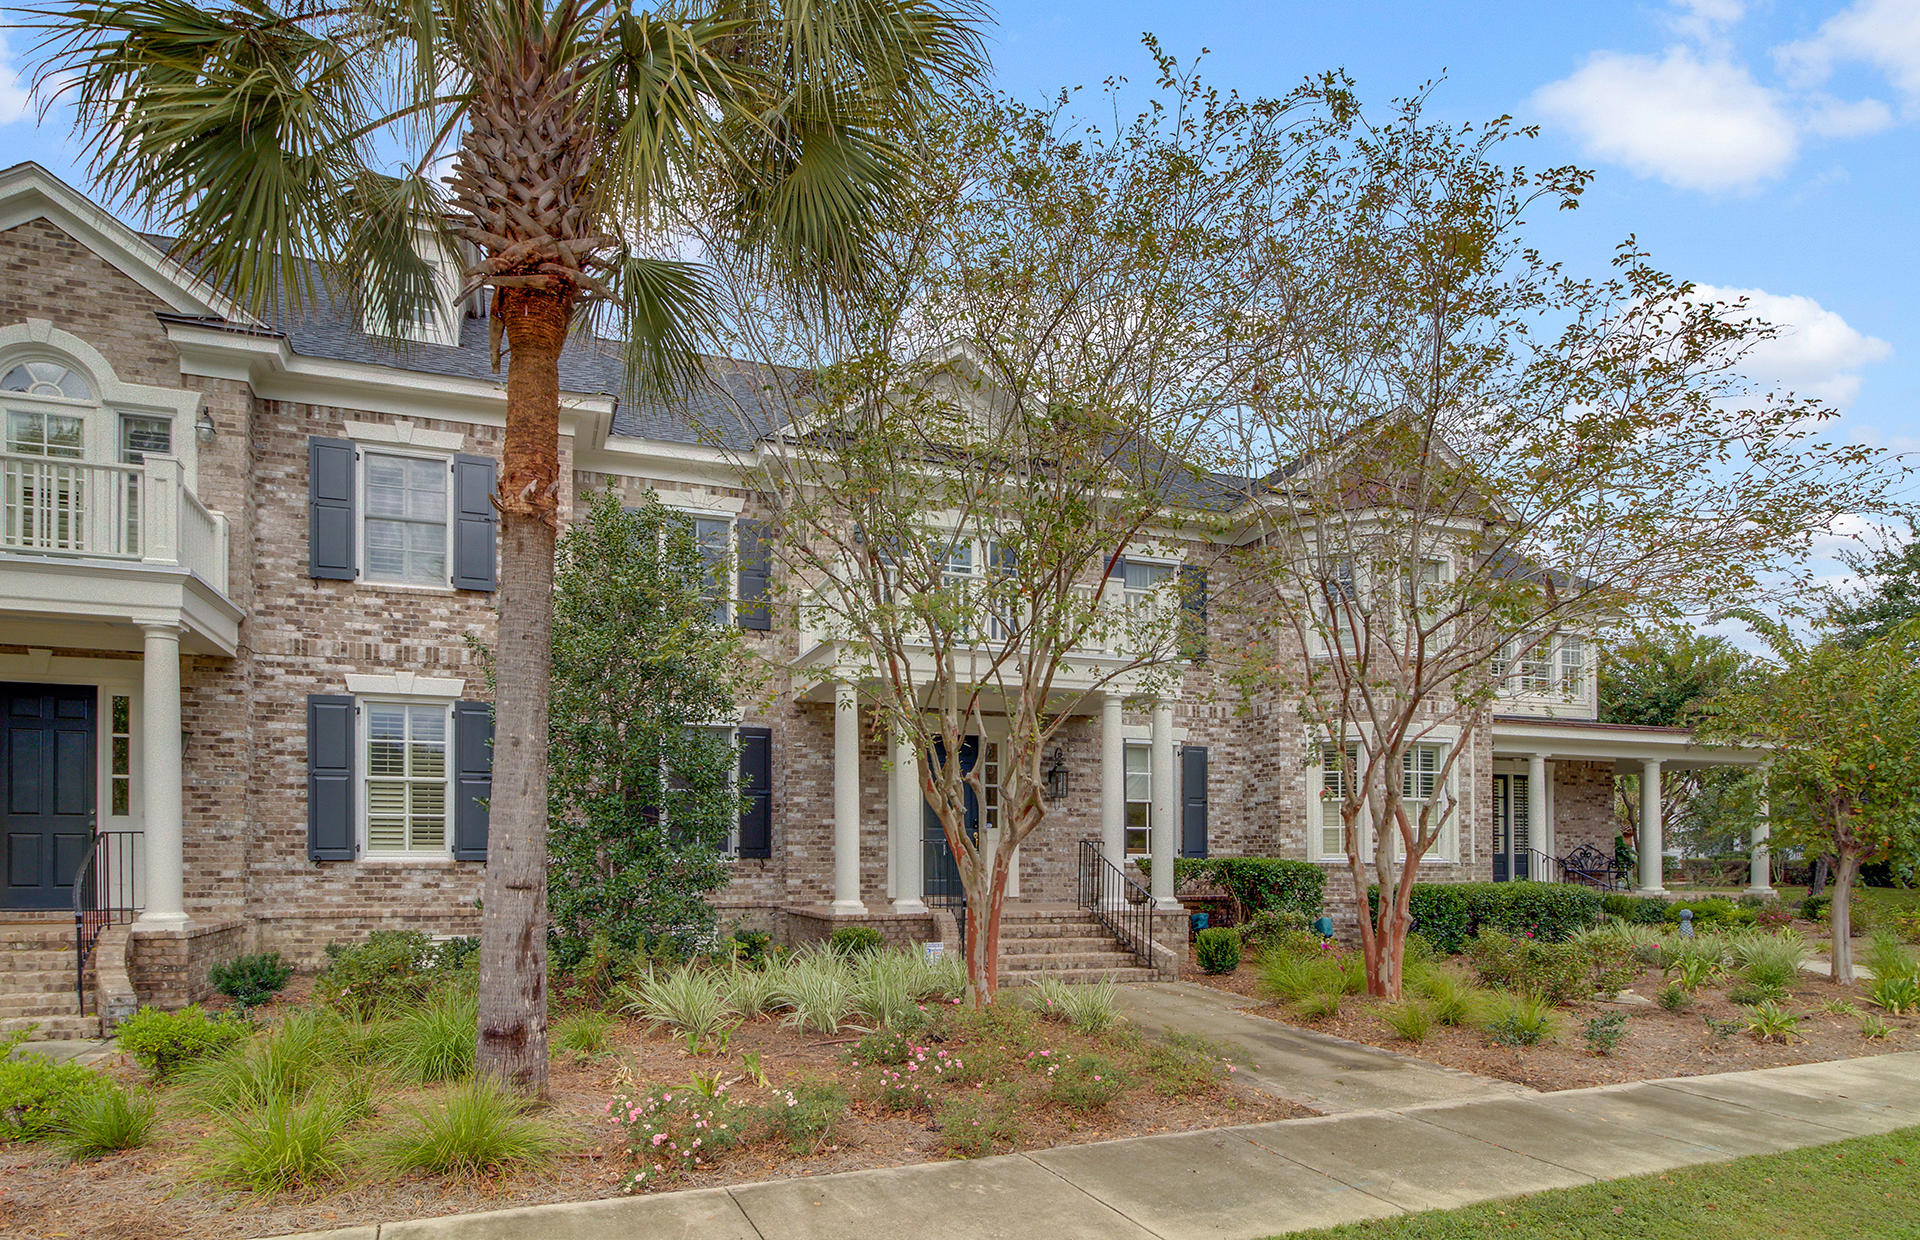 Daniel Island Park Homes For Sale - 4 Grove, Daniel Island, SC - 26